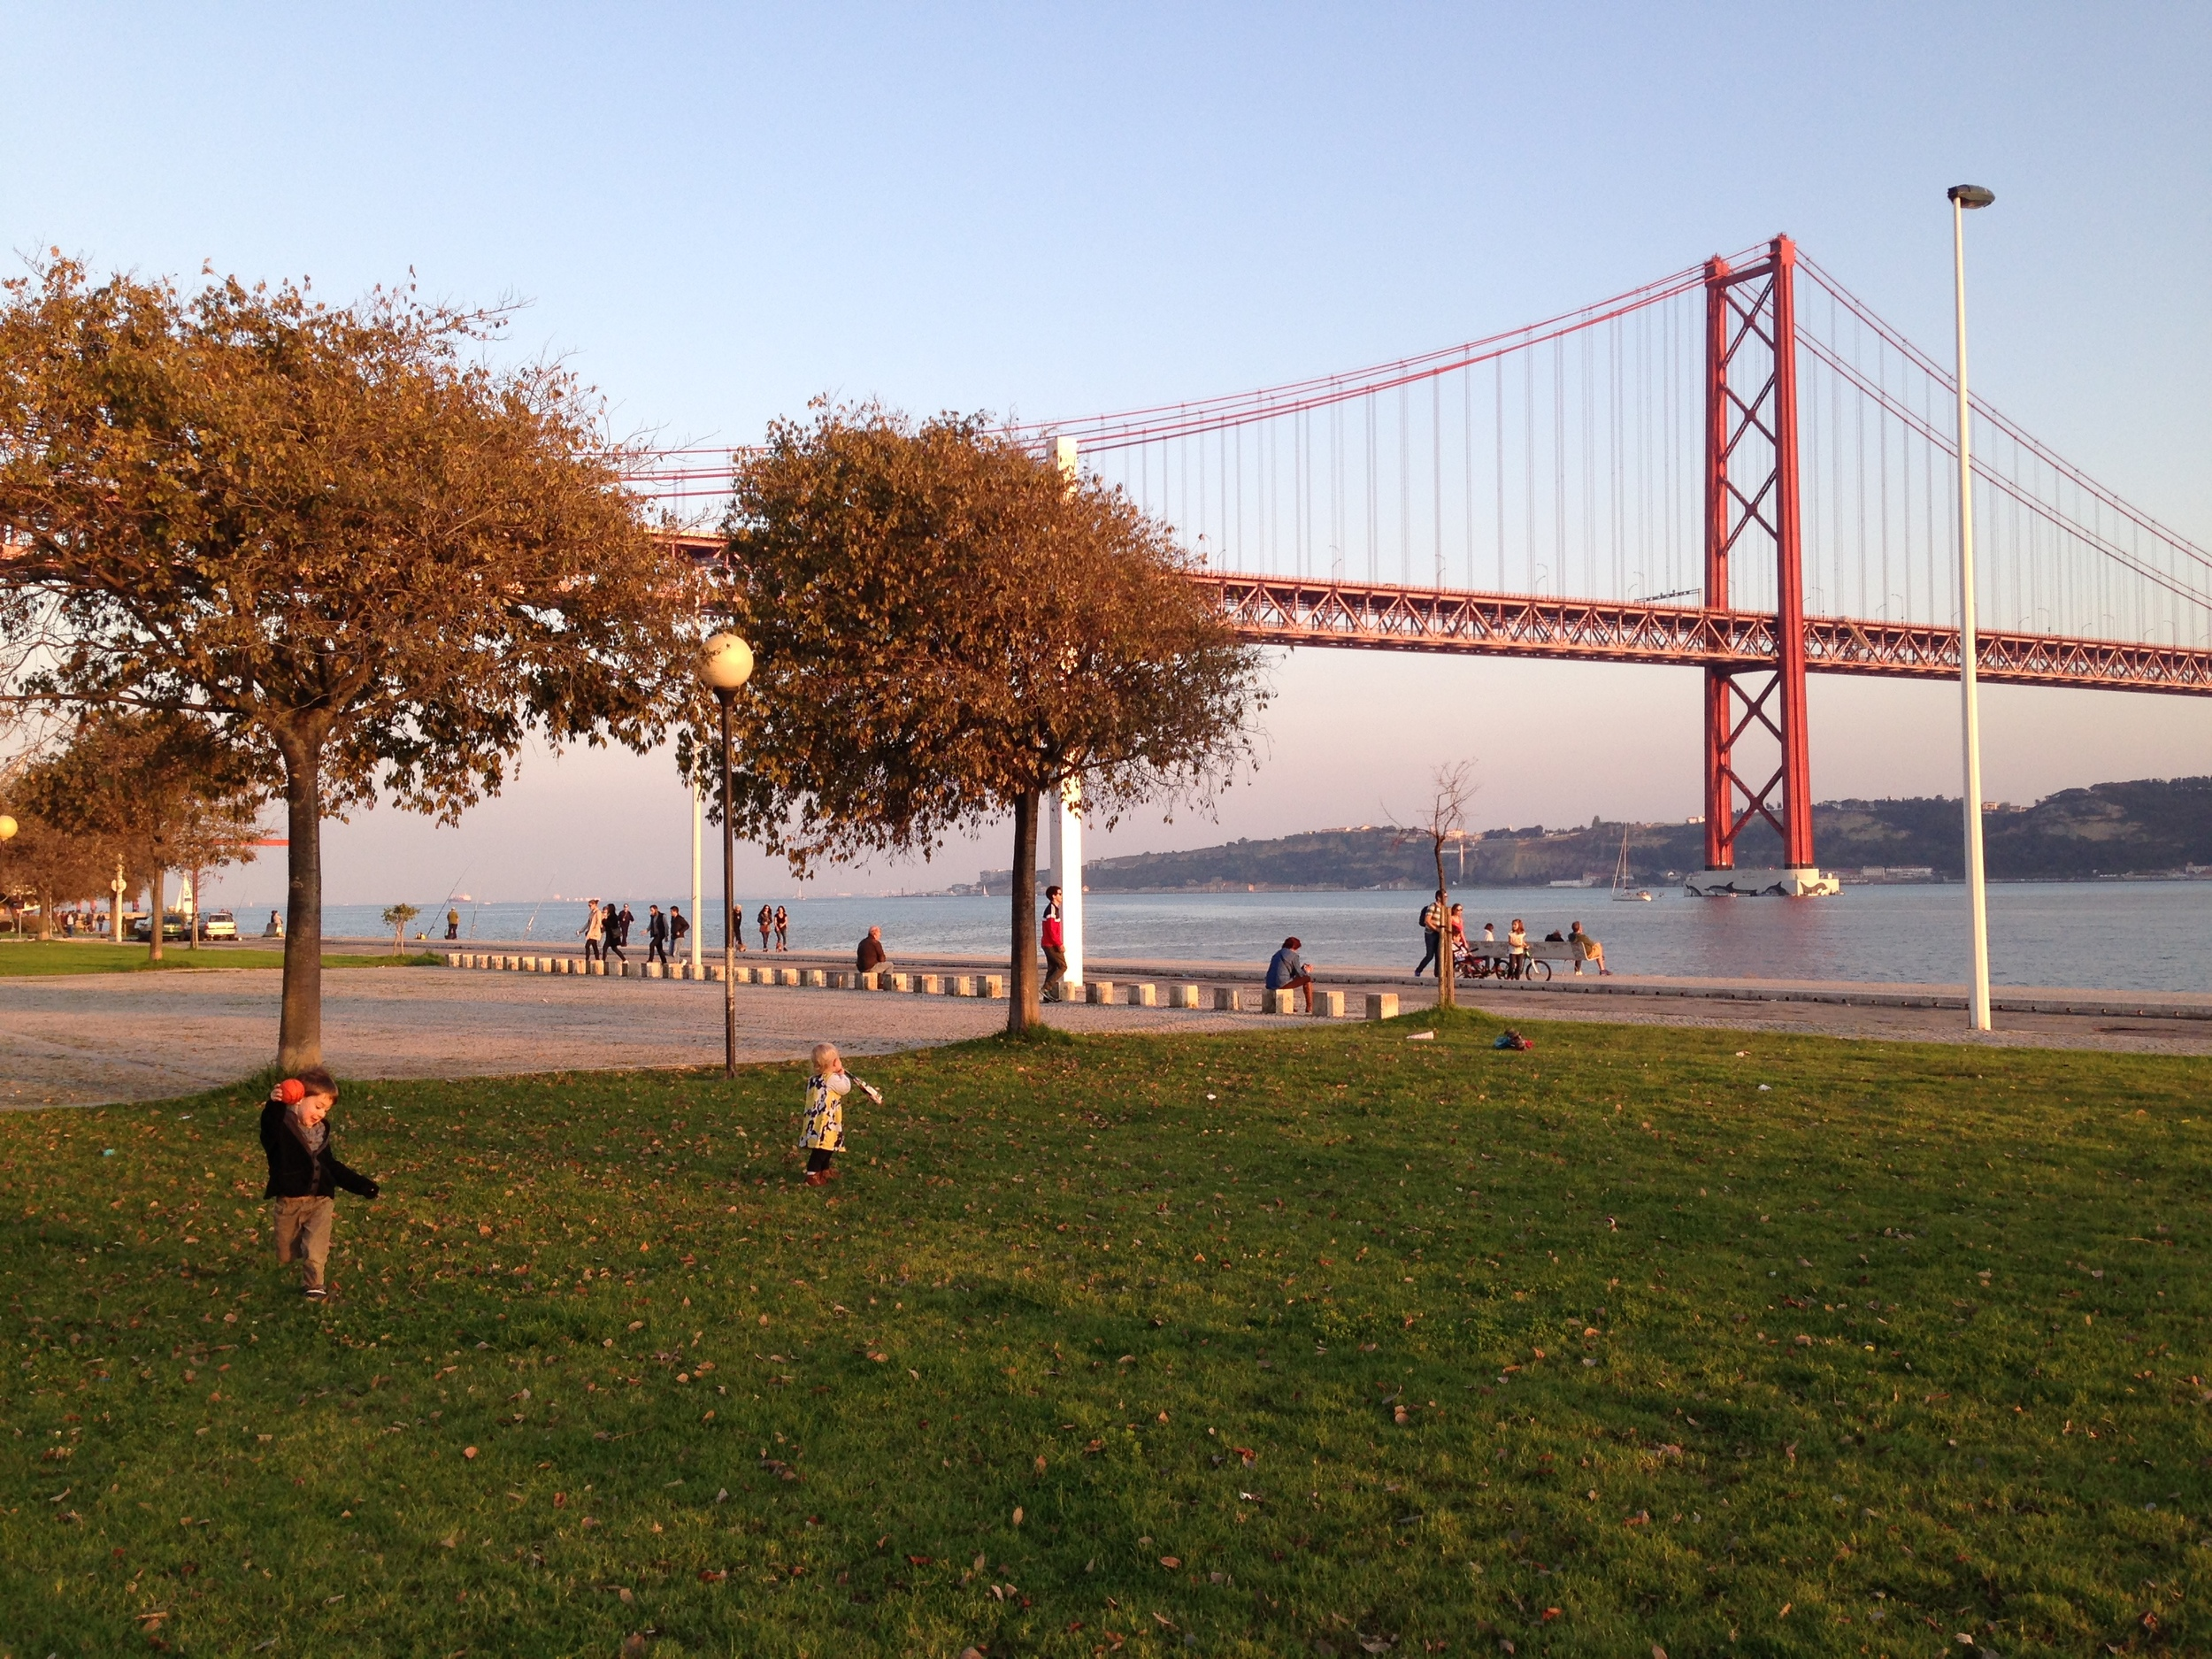 Lisbon, Portugal in November